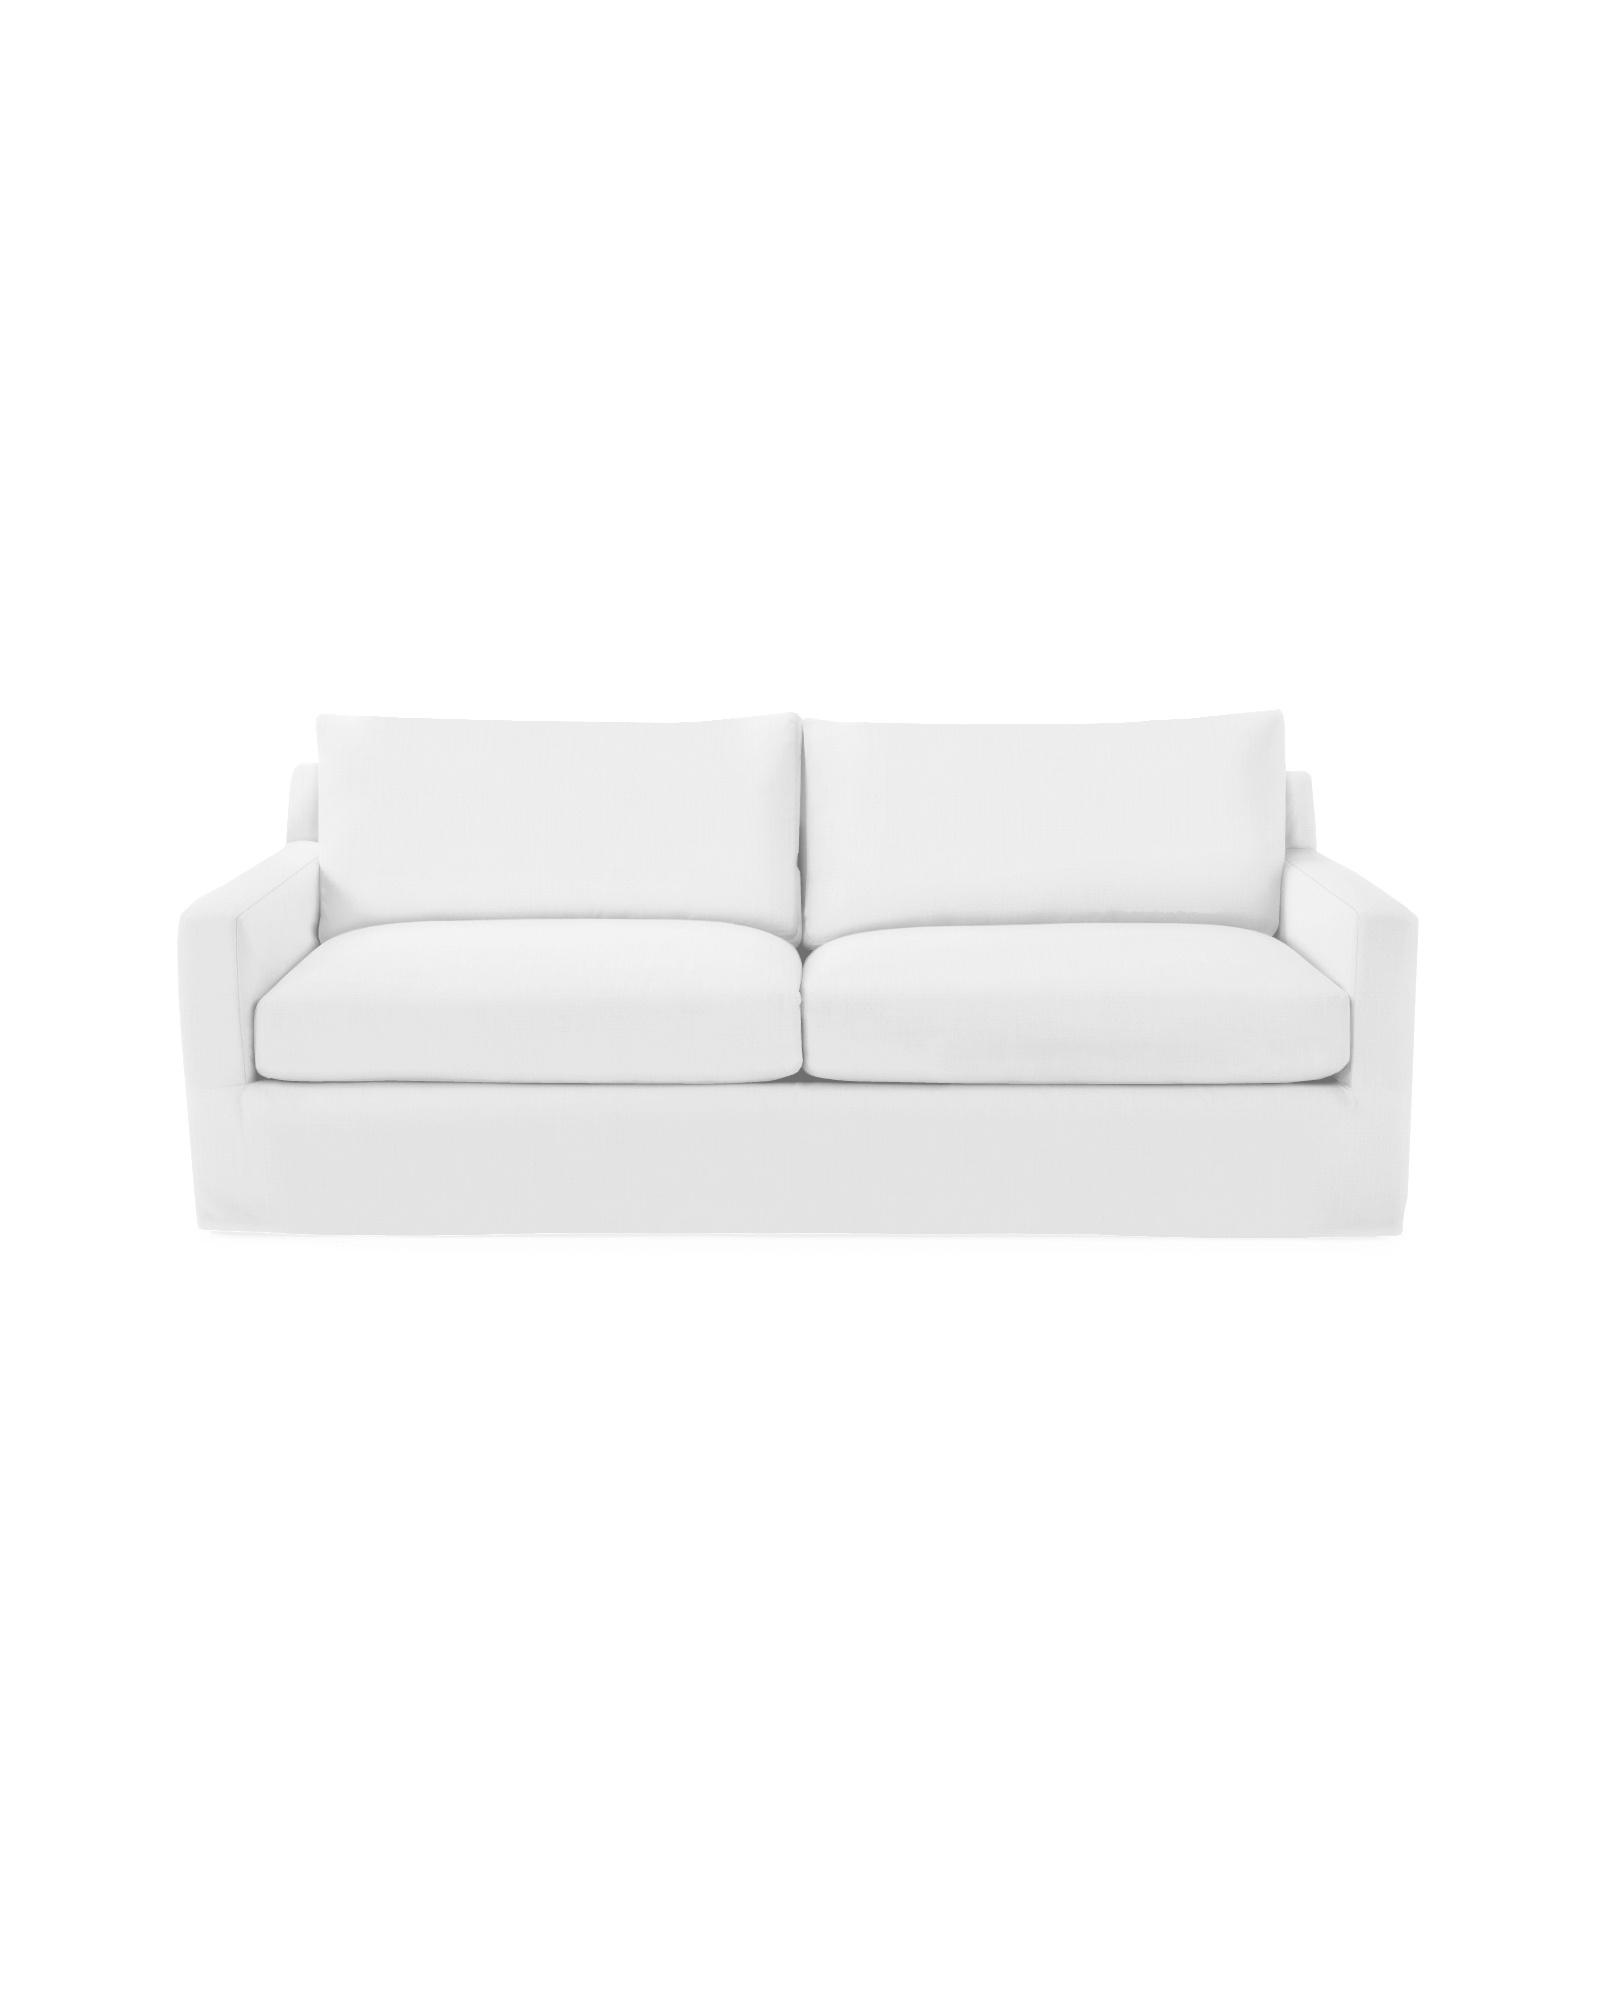 Summit slipcovered sofa - Serena & Lily